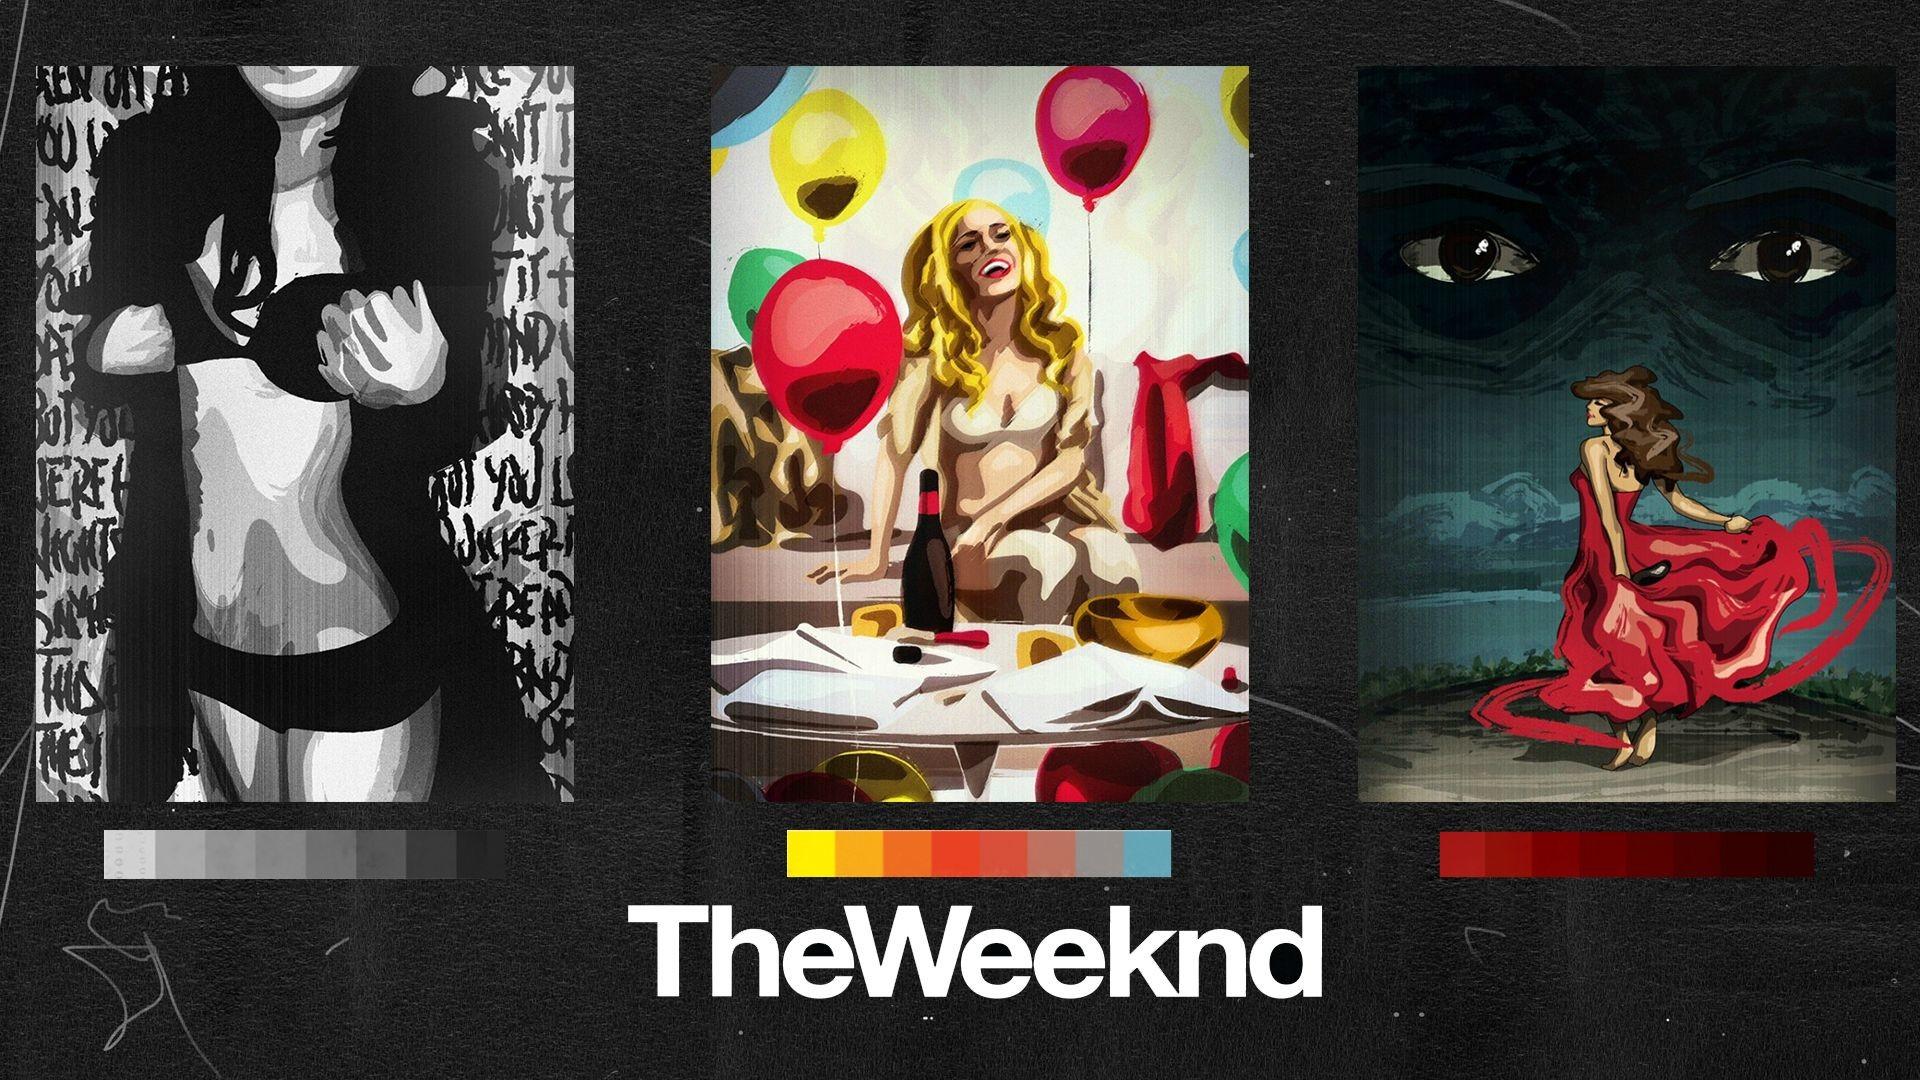 The Weeknd Wallpaper, Celebrities: The Weeknd, Abel Tesfaye, Top 1920×1080